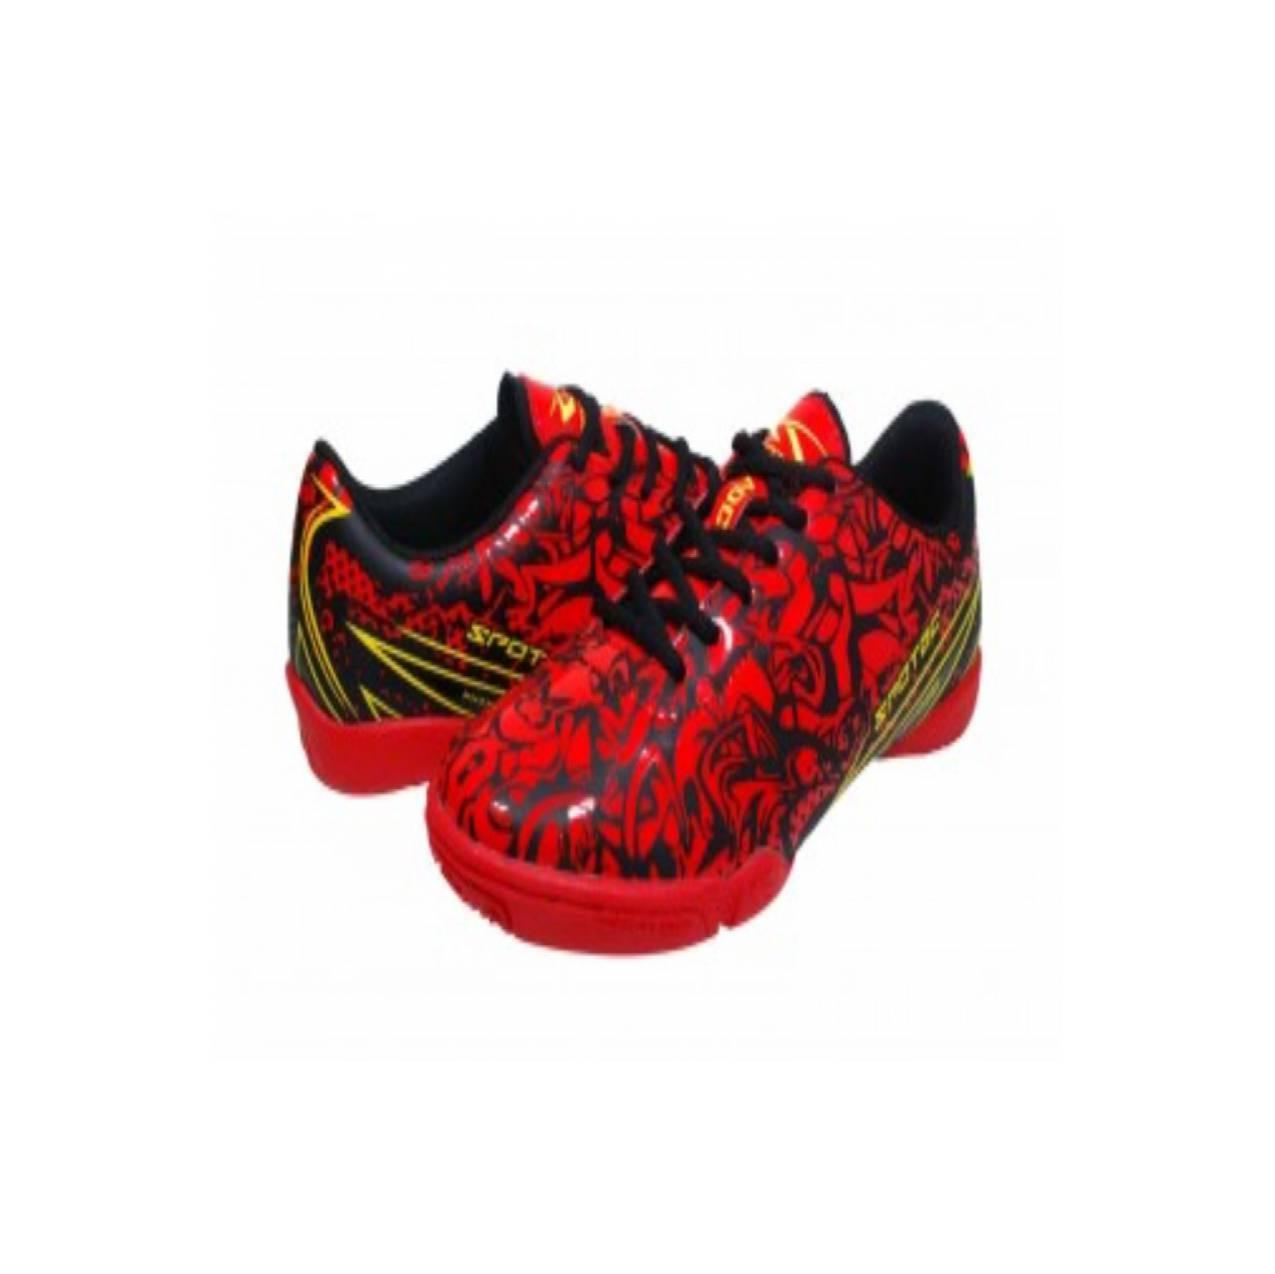 SPOTEC Phantom Indoor ( Sepatu Futsal Diskon )